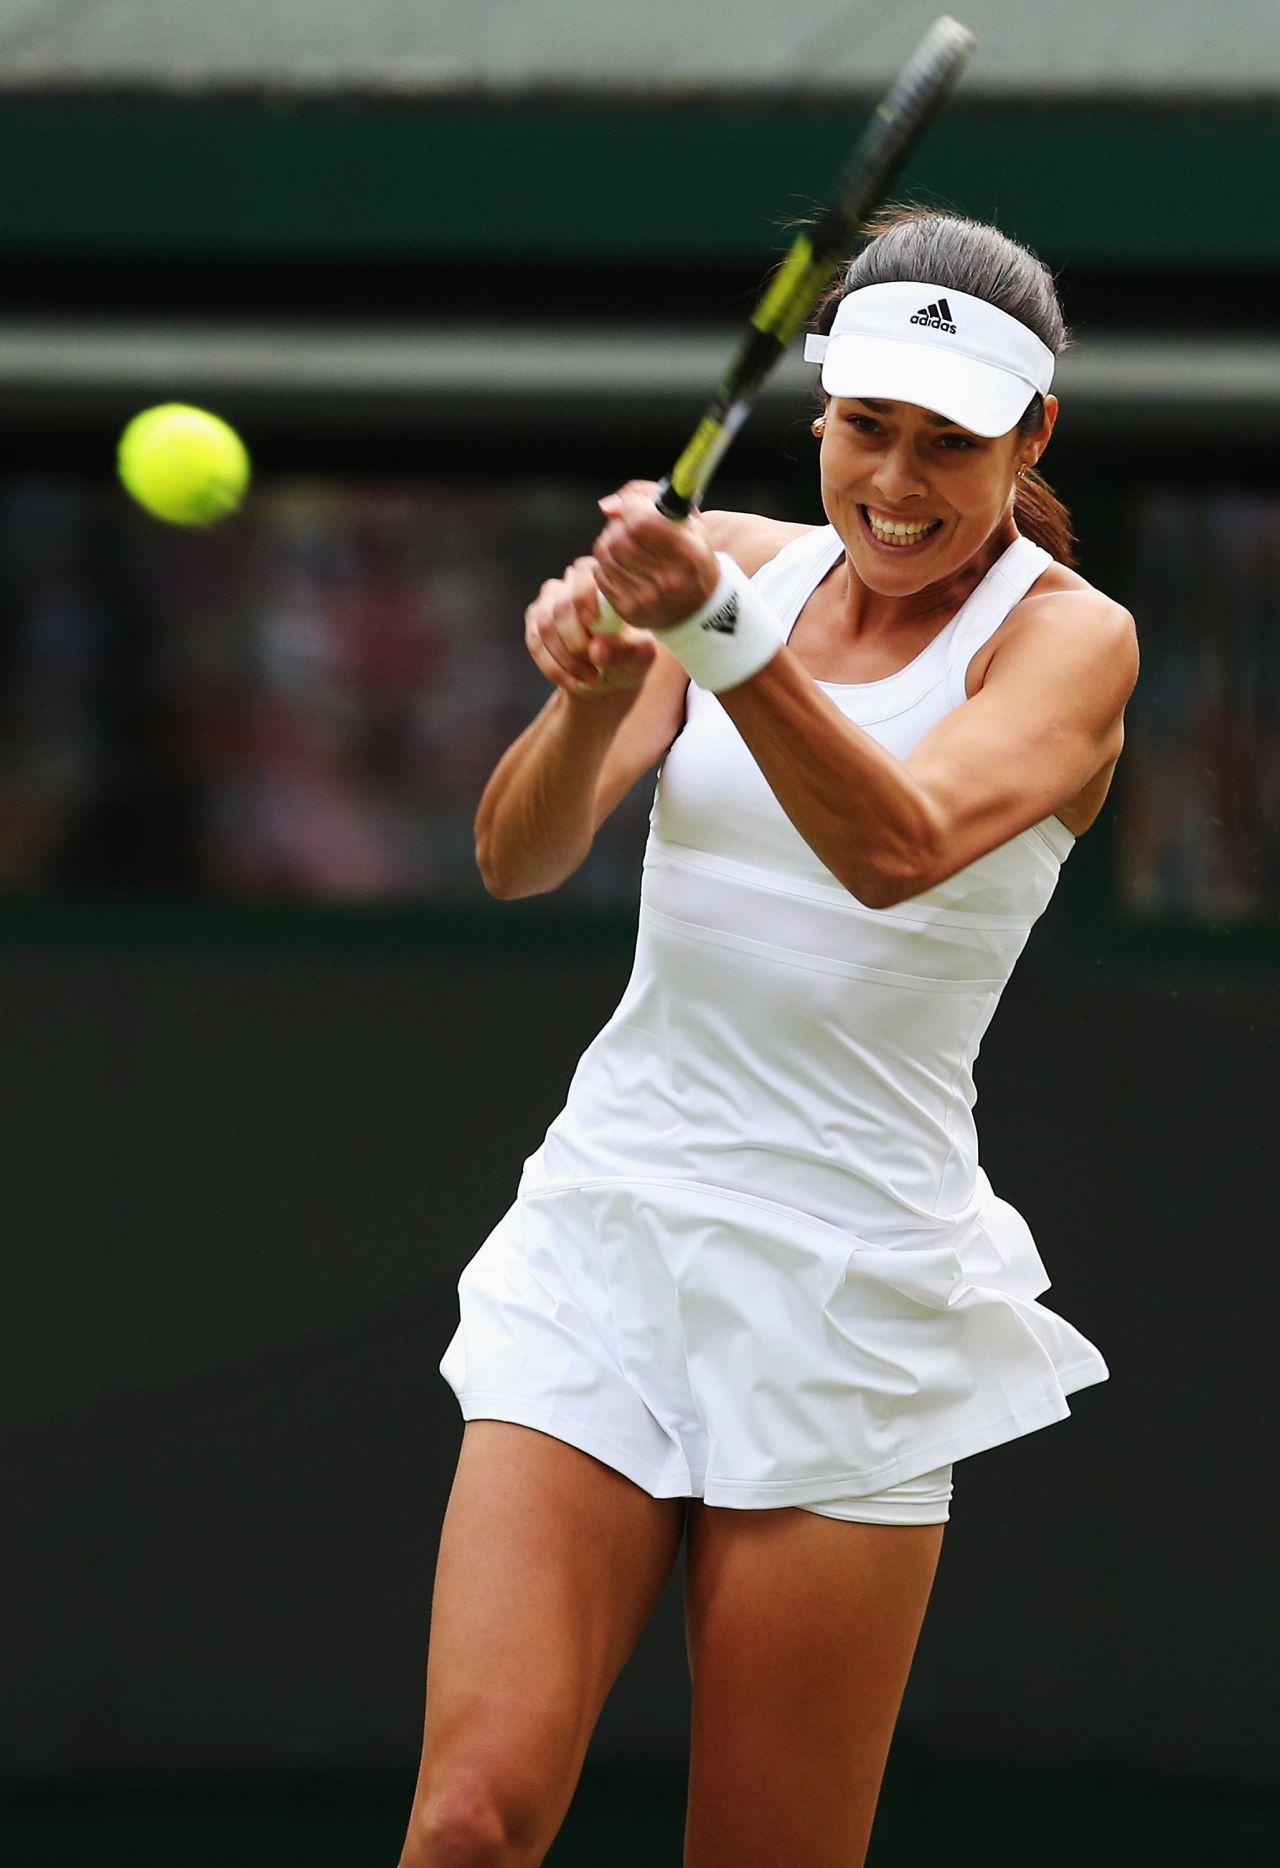 Ana Ivanovic Wimbledon Tennis Championships 2014 1st Round